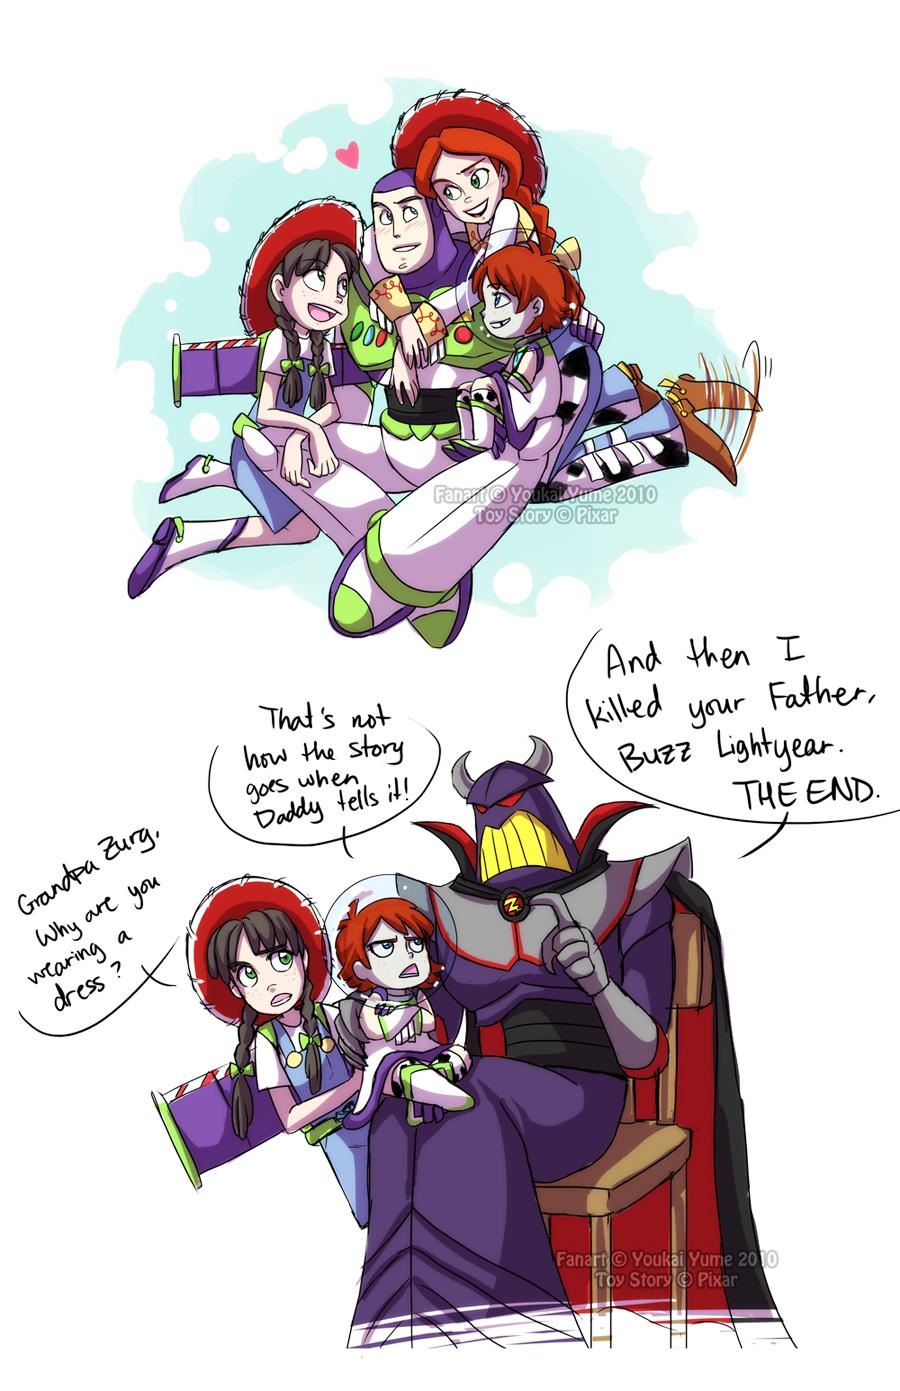 The Lightyears...and Grandpa